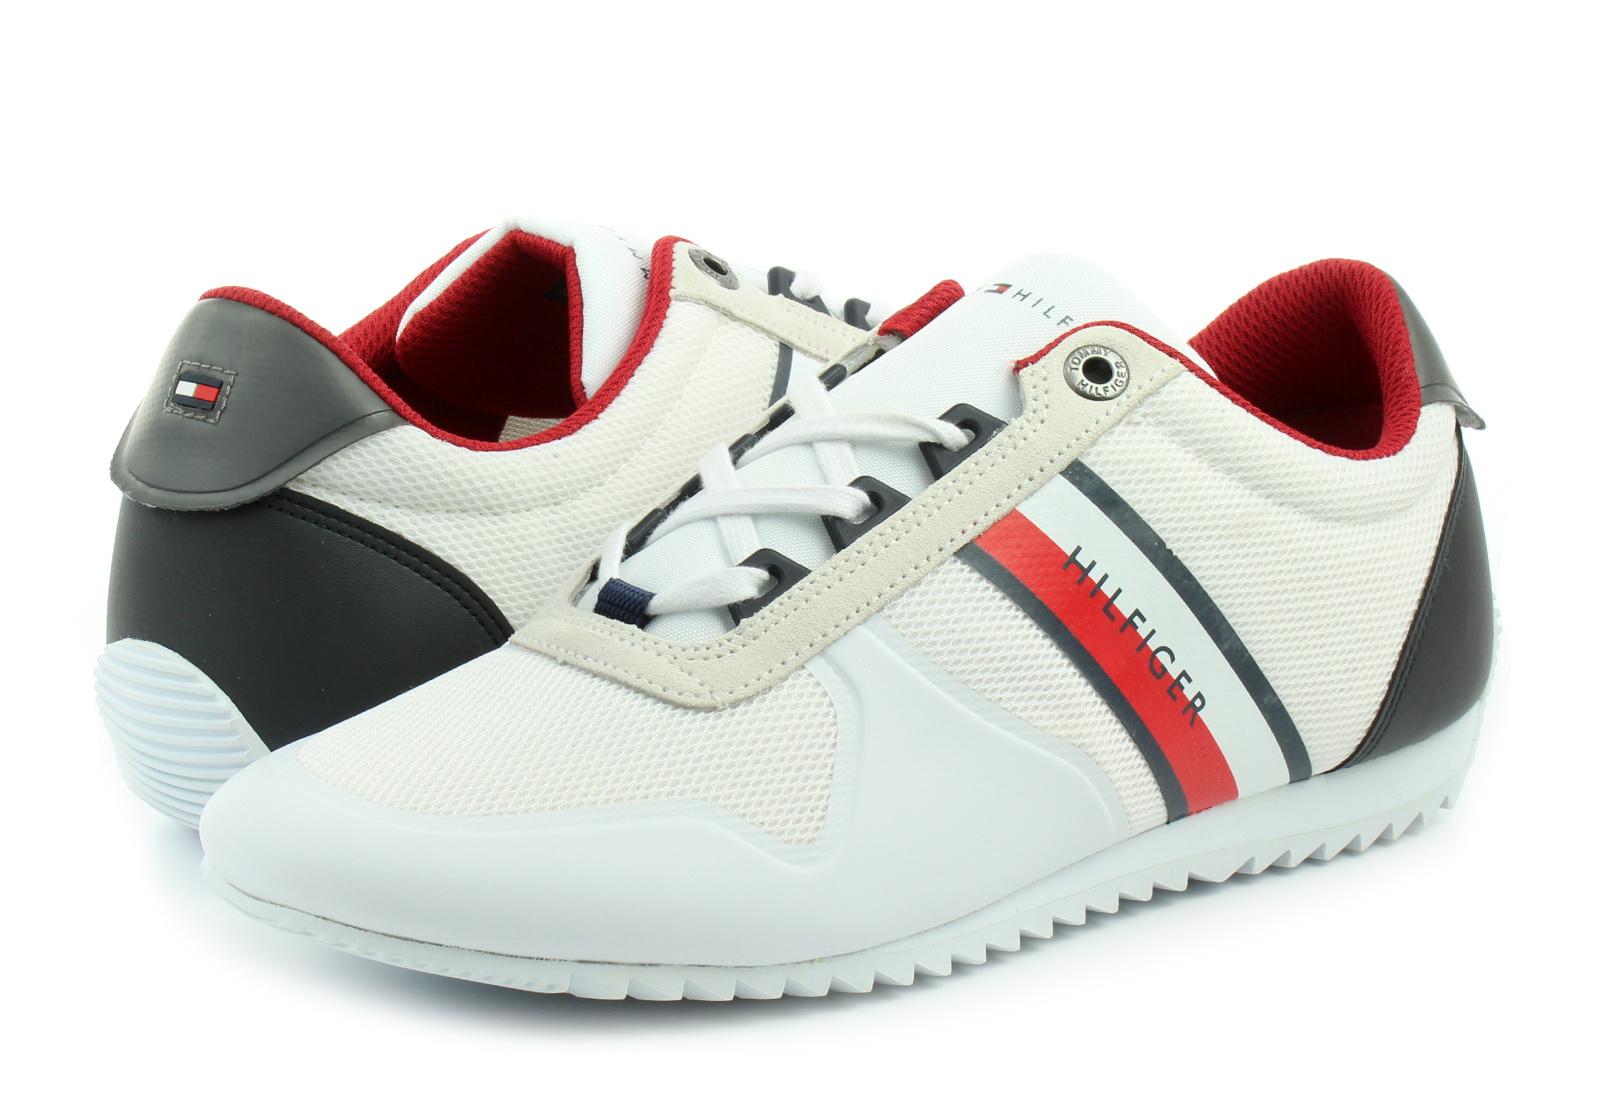 43bf06a891 Tommy Hilfiger Cipő - Branson 17c - 19R-2270-020 - Office Shoes ...